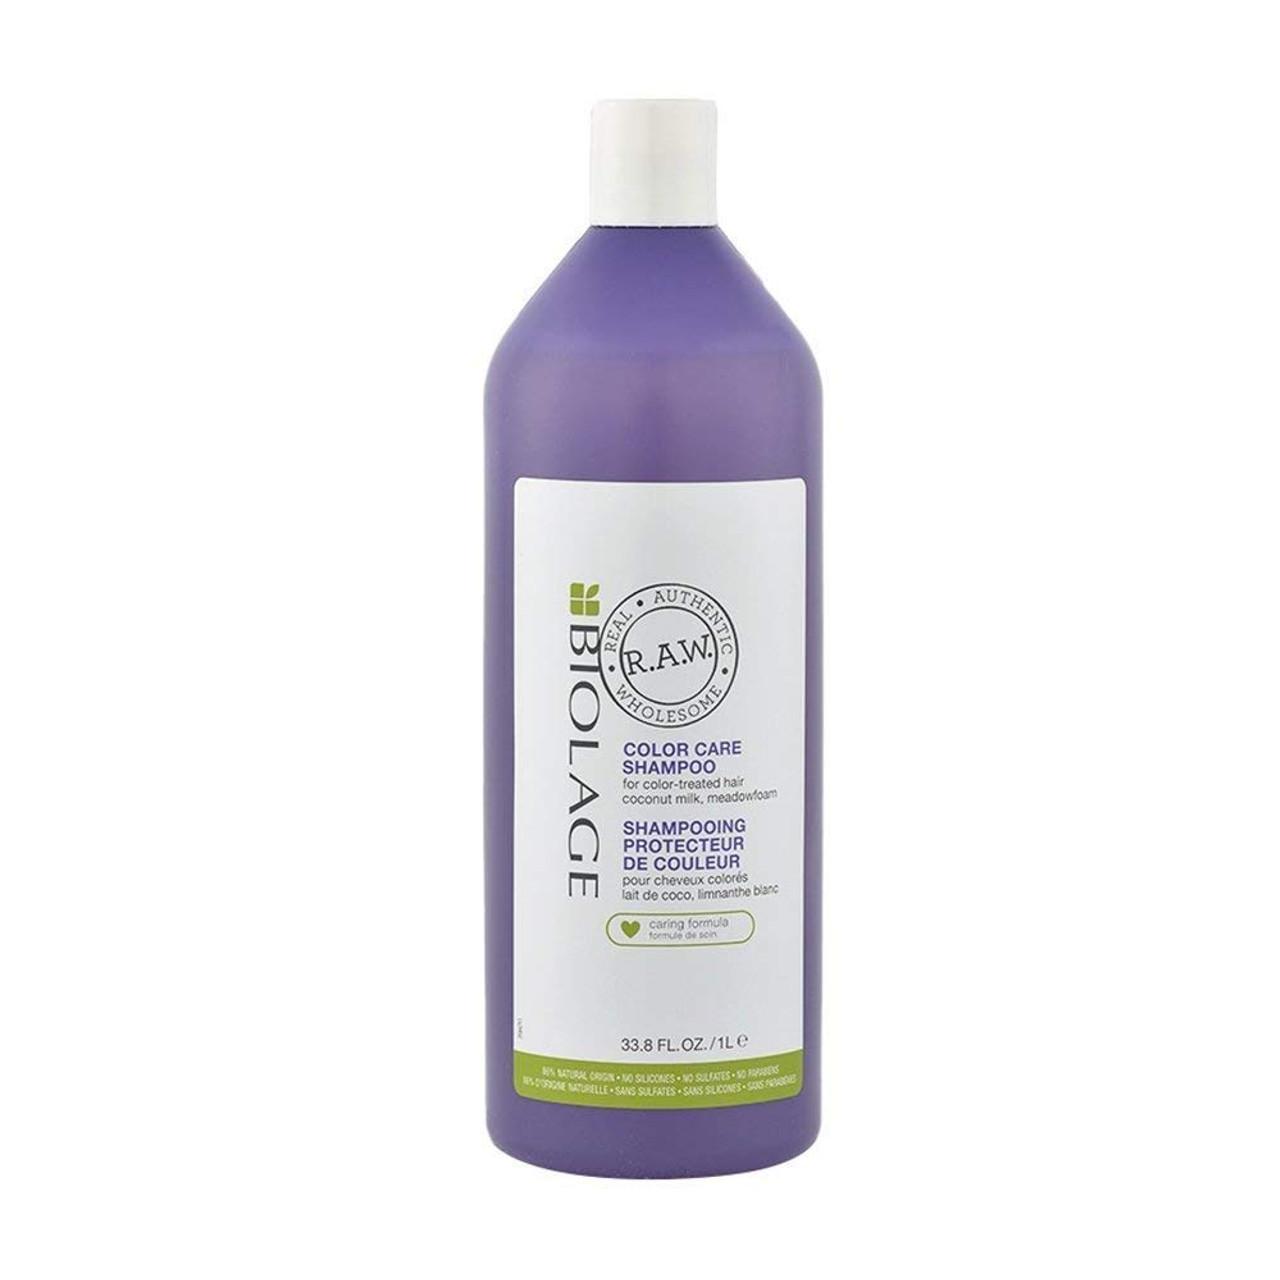 Biolage Raw Color Care Shampoo 1L